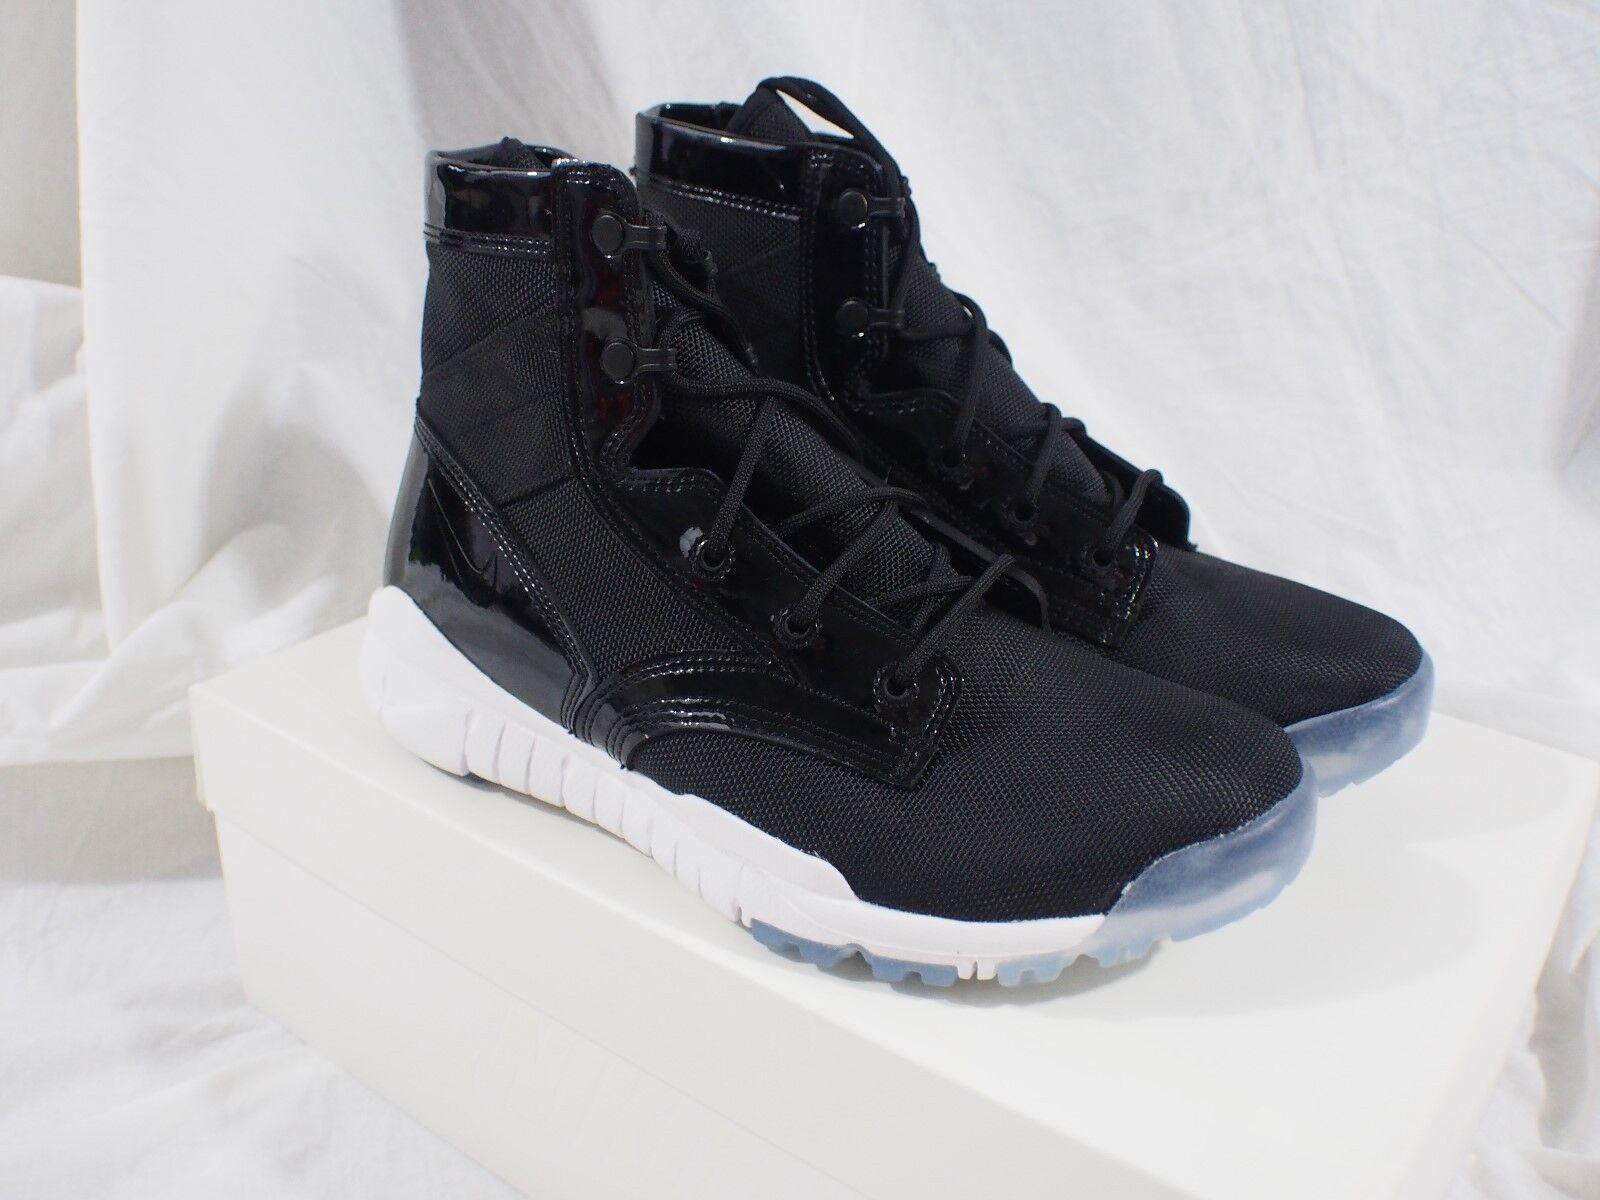 Brand New Nike Shoes SFB 6